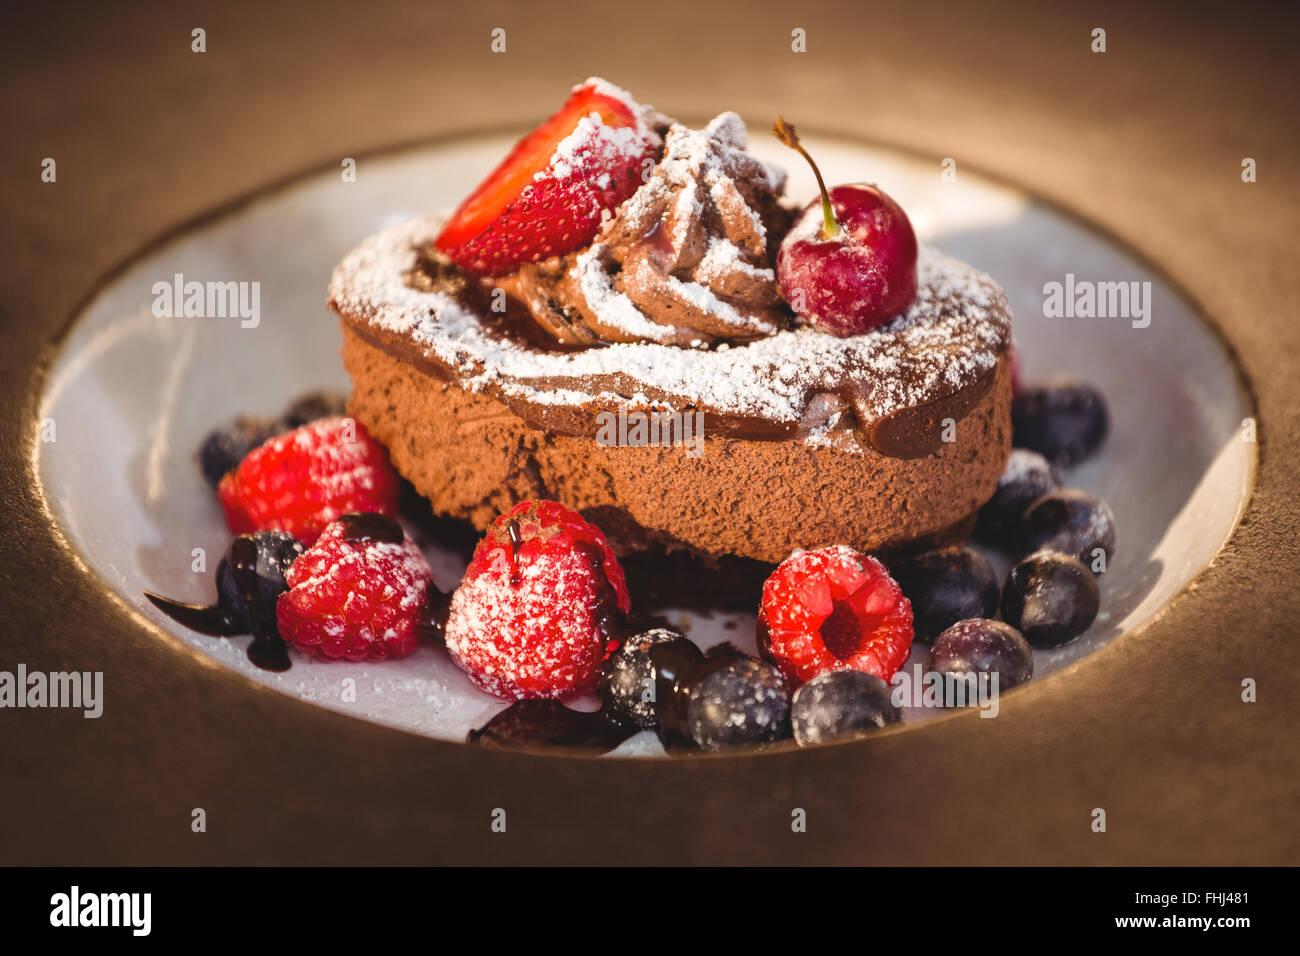 Close up of chocolate dessert - Stock Image